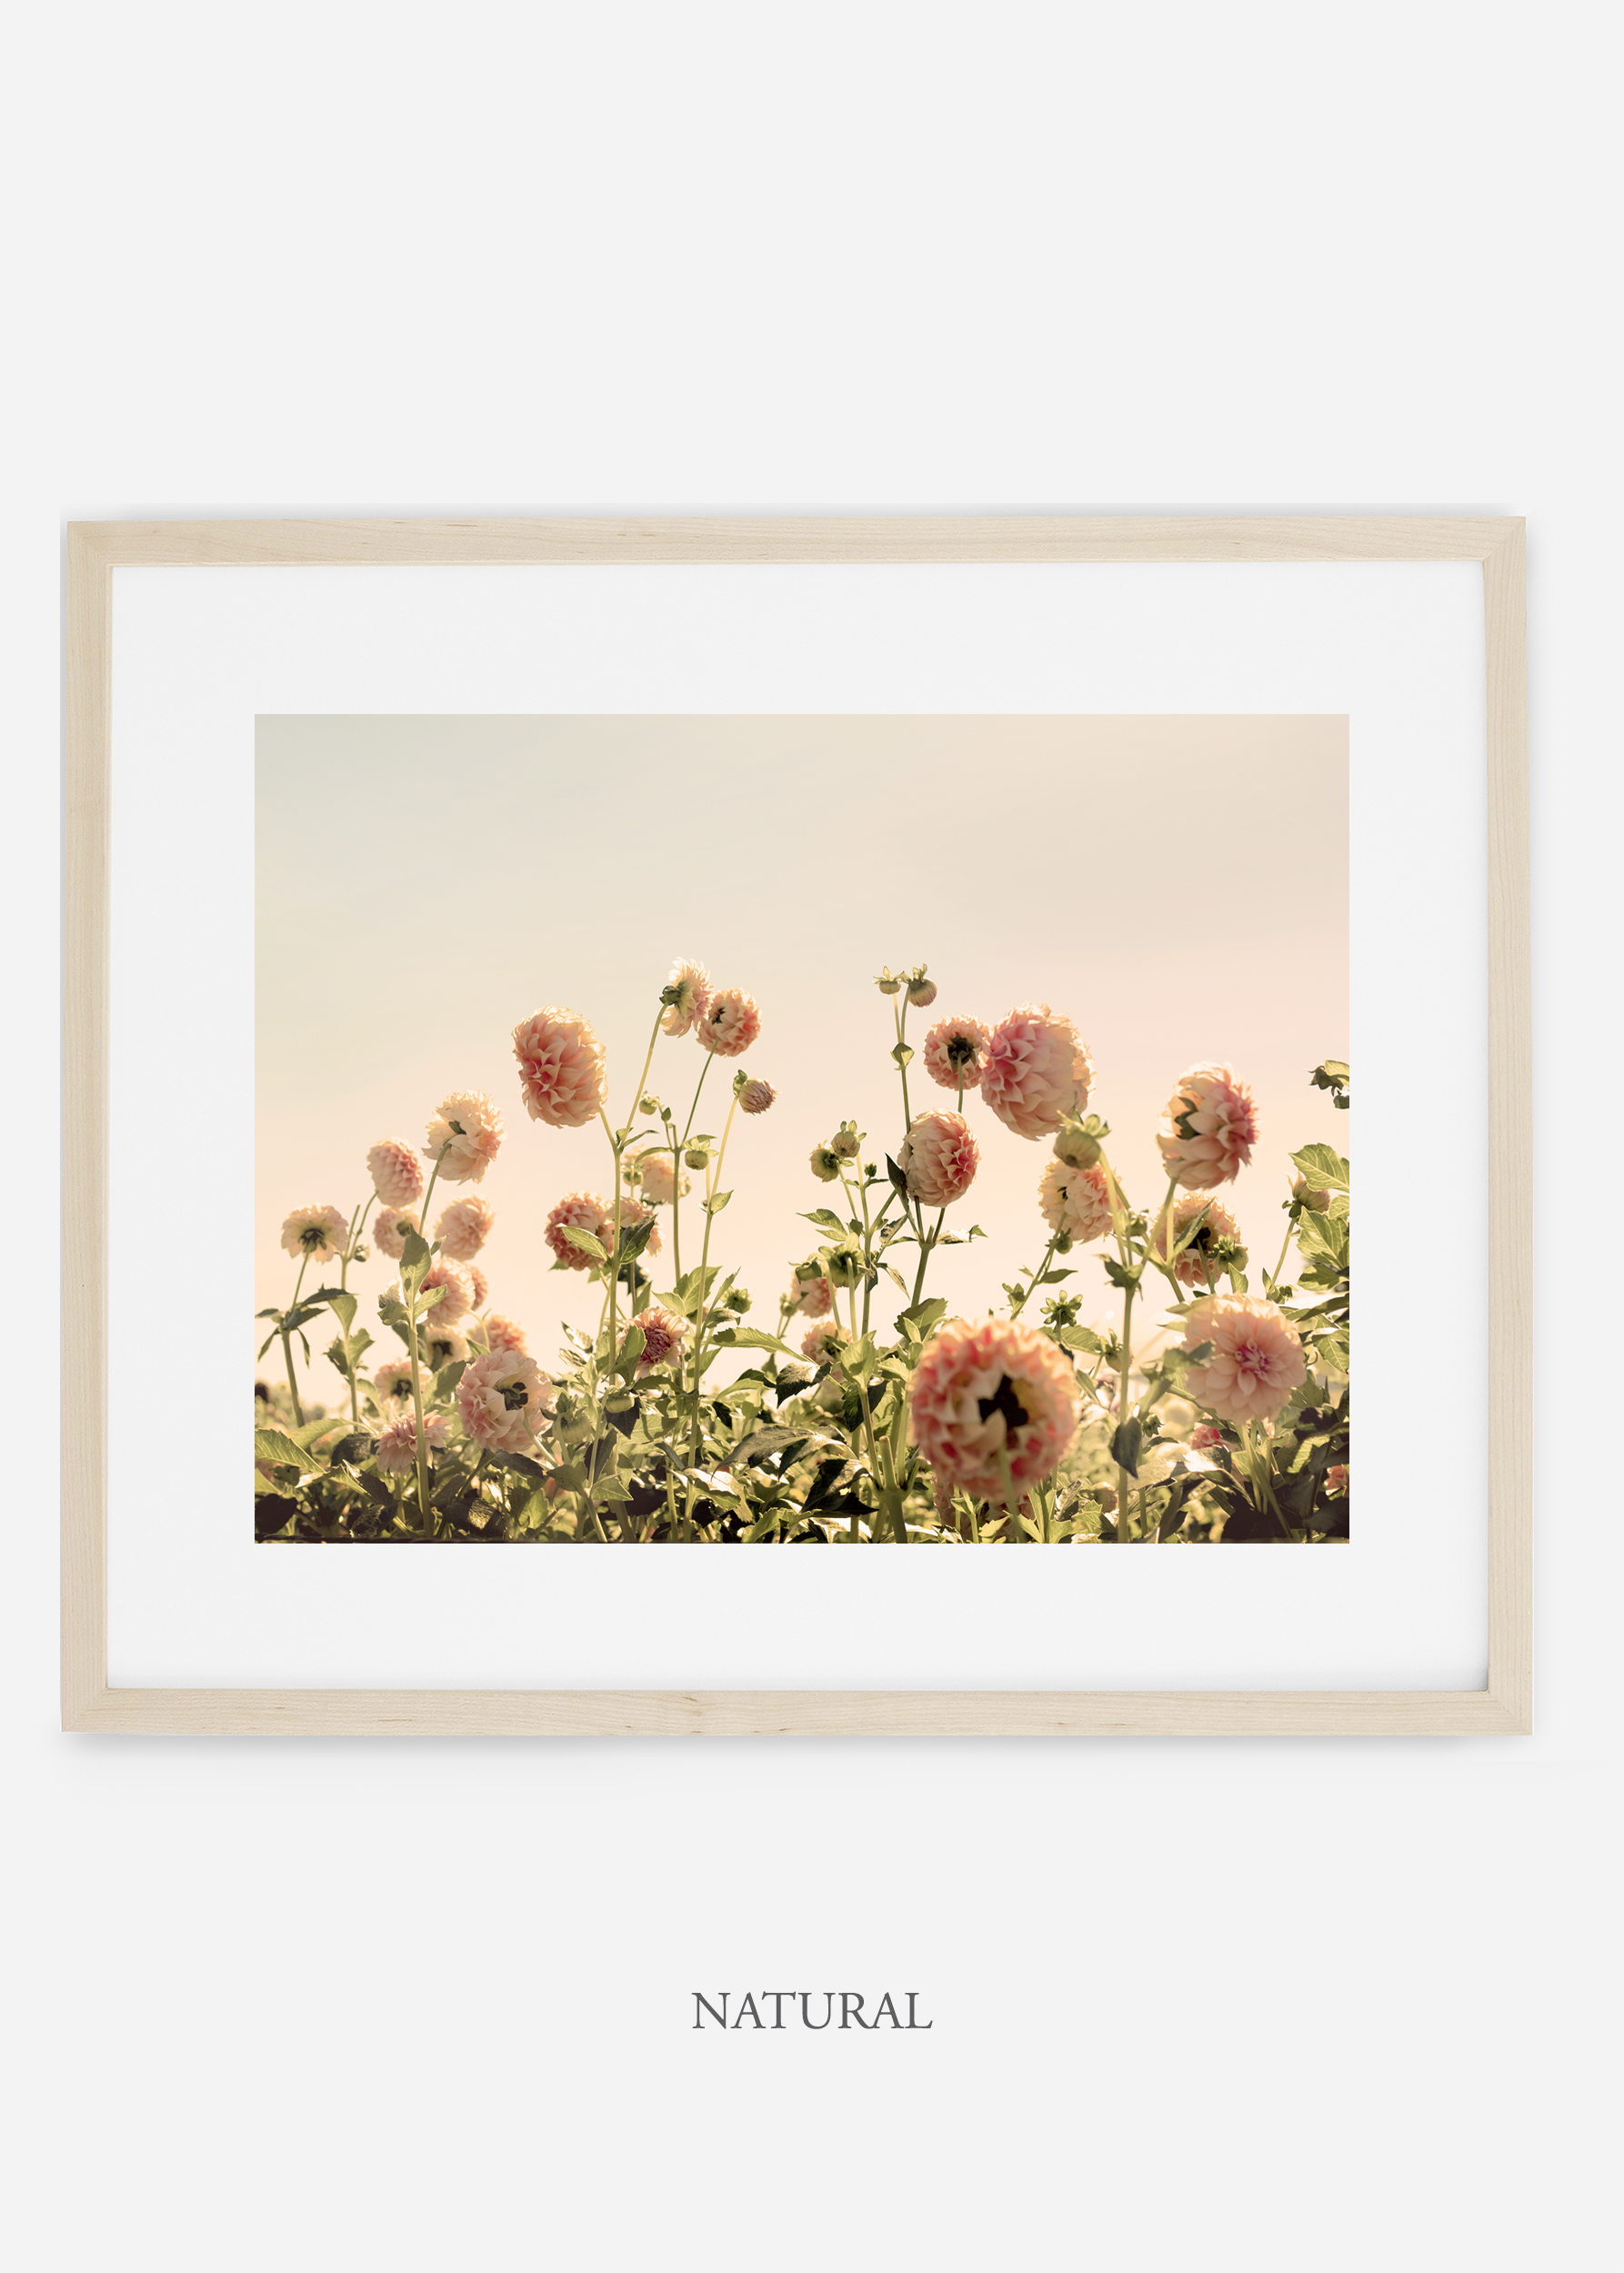 NaturalFrame_DahliaNo.1_WilderCalifornia_Art_Floral_Homedecor_Prints_Dahlia_Botanical_Artwork_Interiordesign.jpg